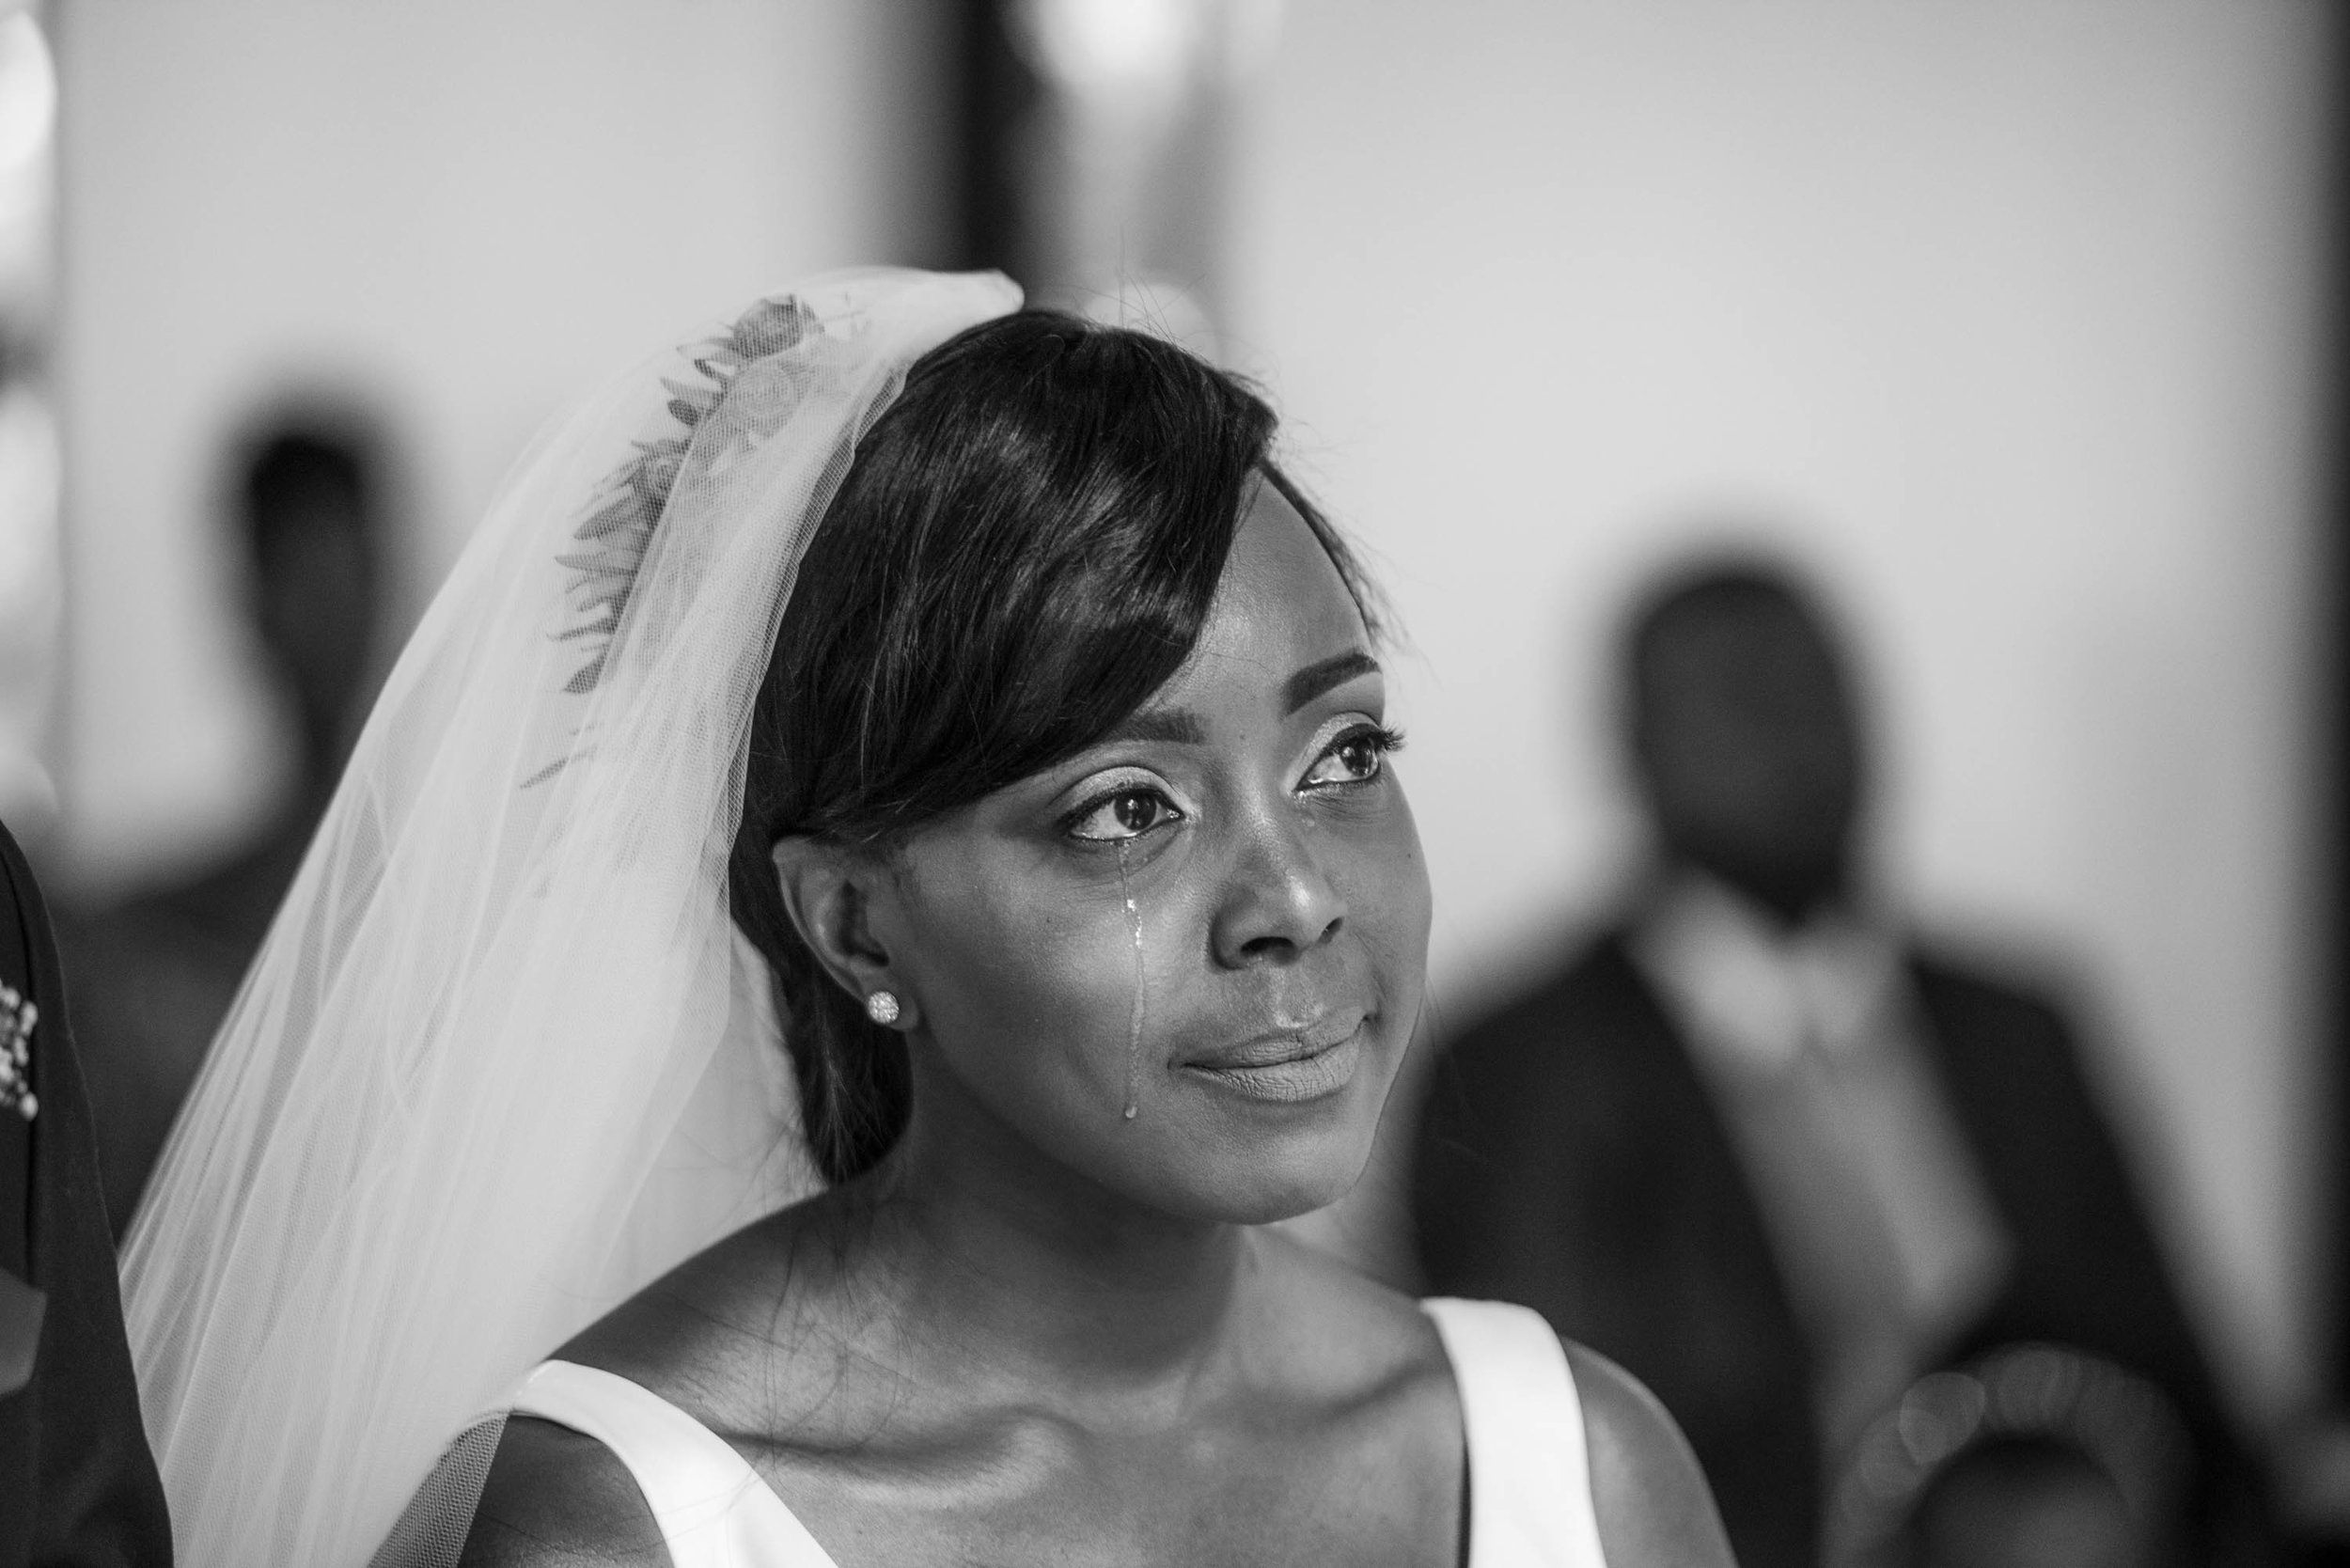 069-toadbury-hall-wedding-photos.JPG